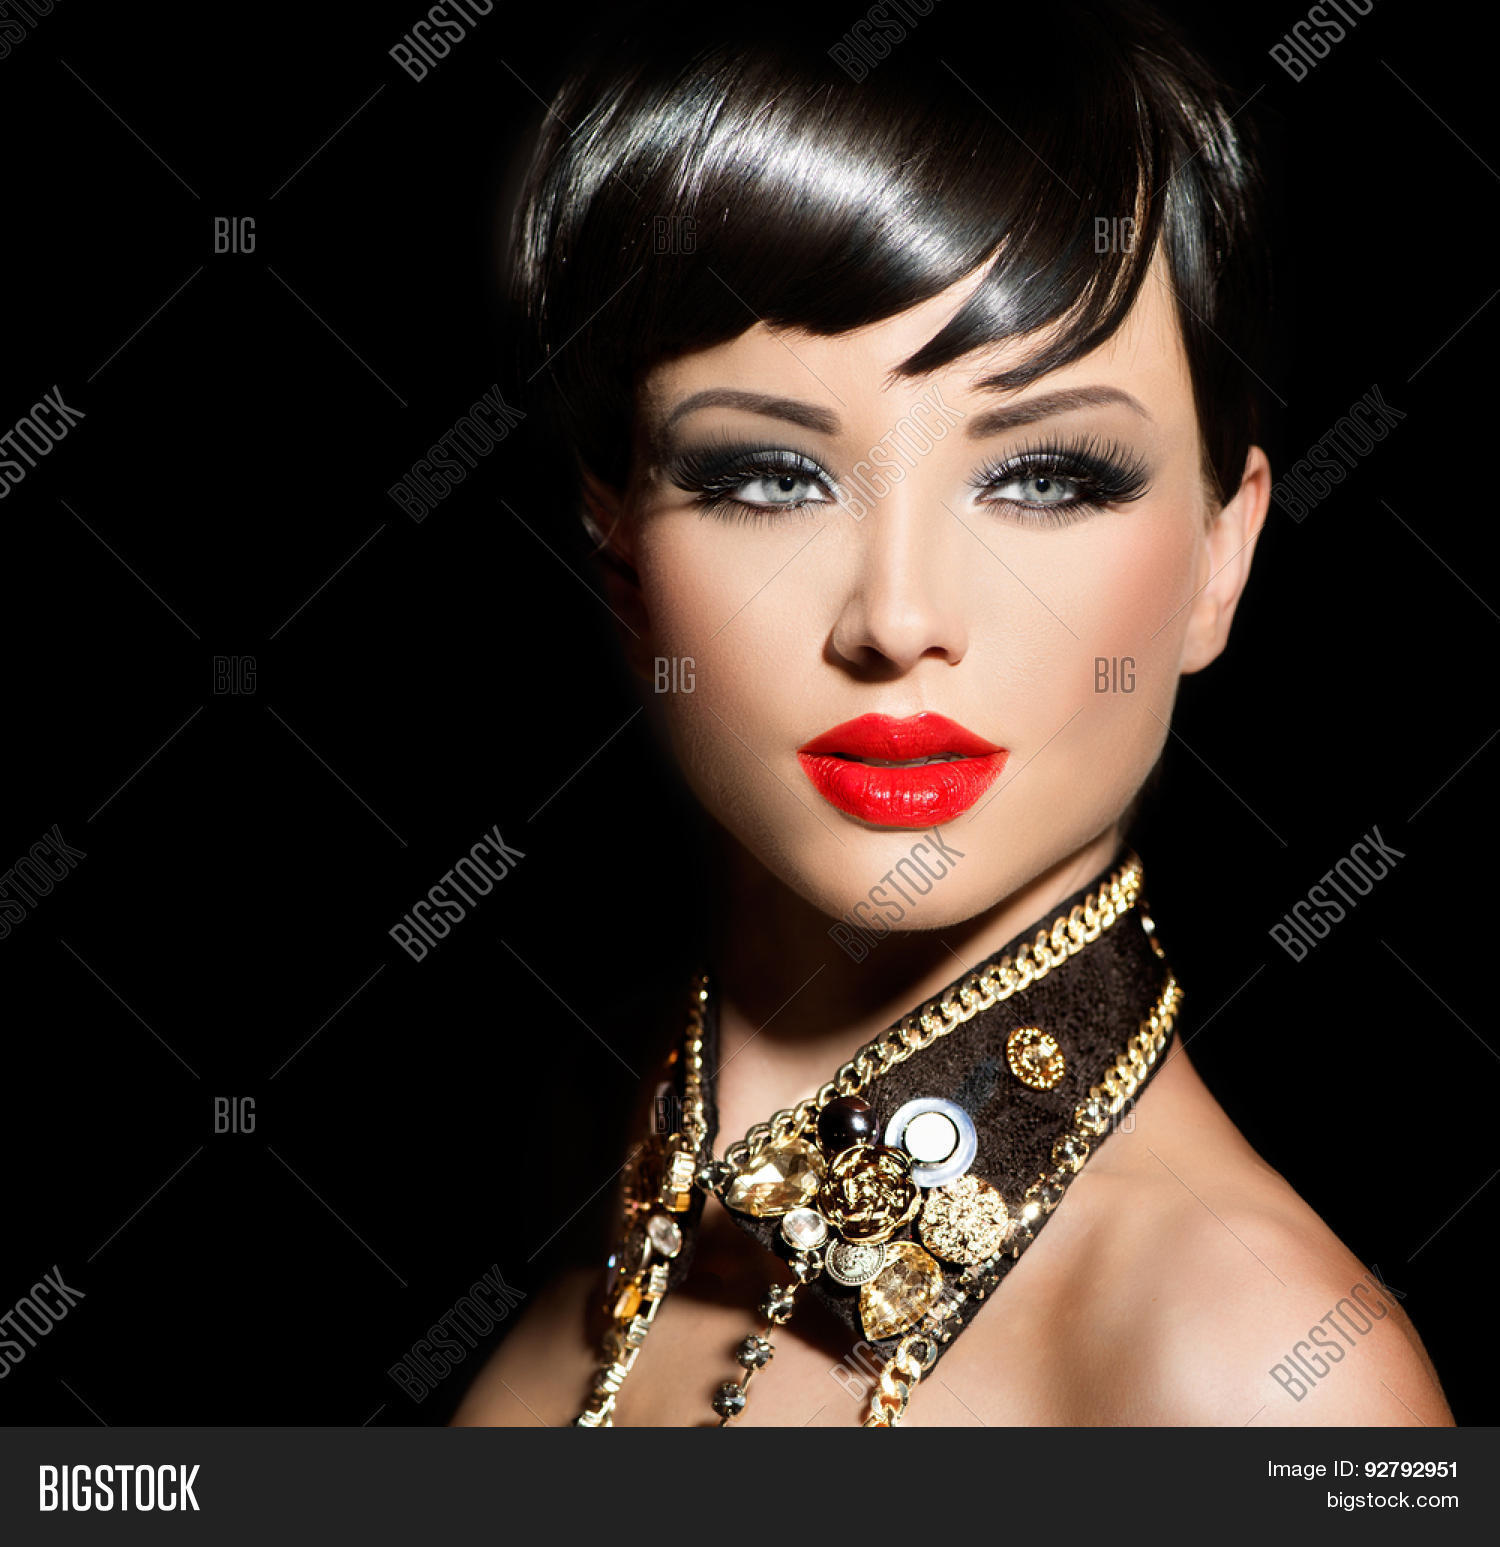 Beauty Fashion Model Girl Short Image Photo Bigstock - Haircut girl model